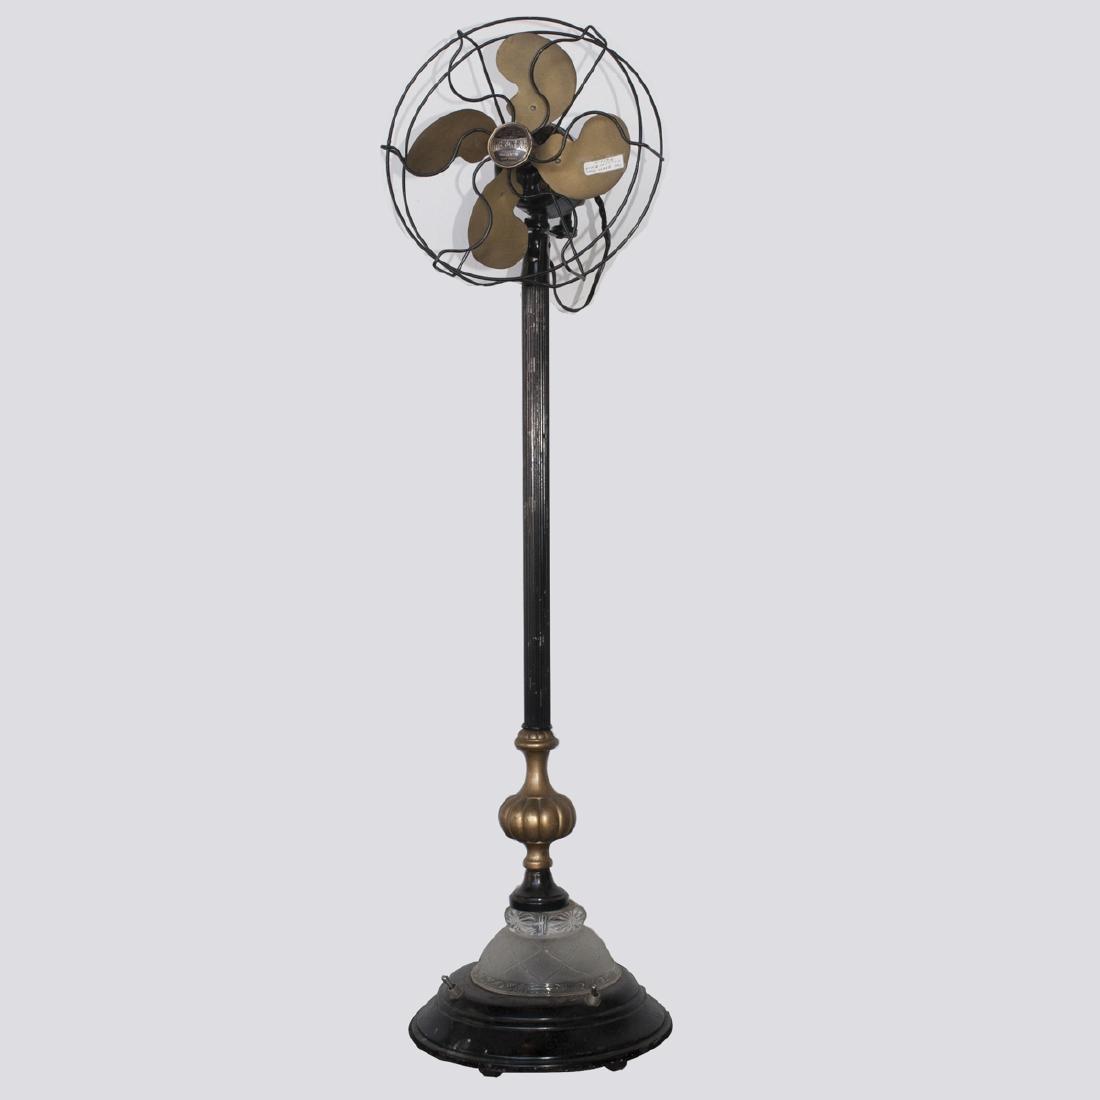 Antique Emerson MFG Co. Oscillating Fan